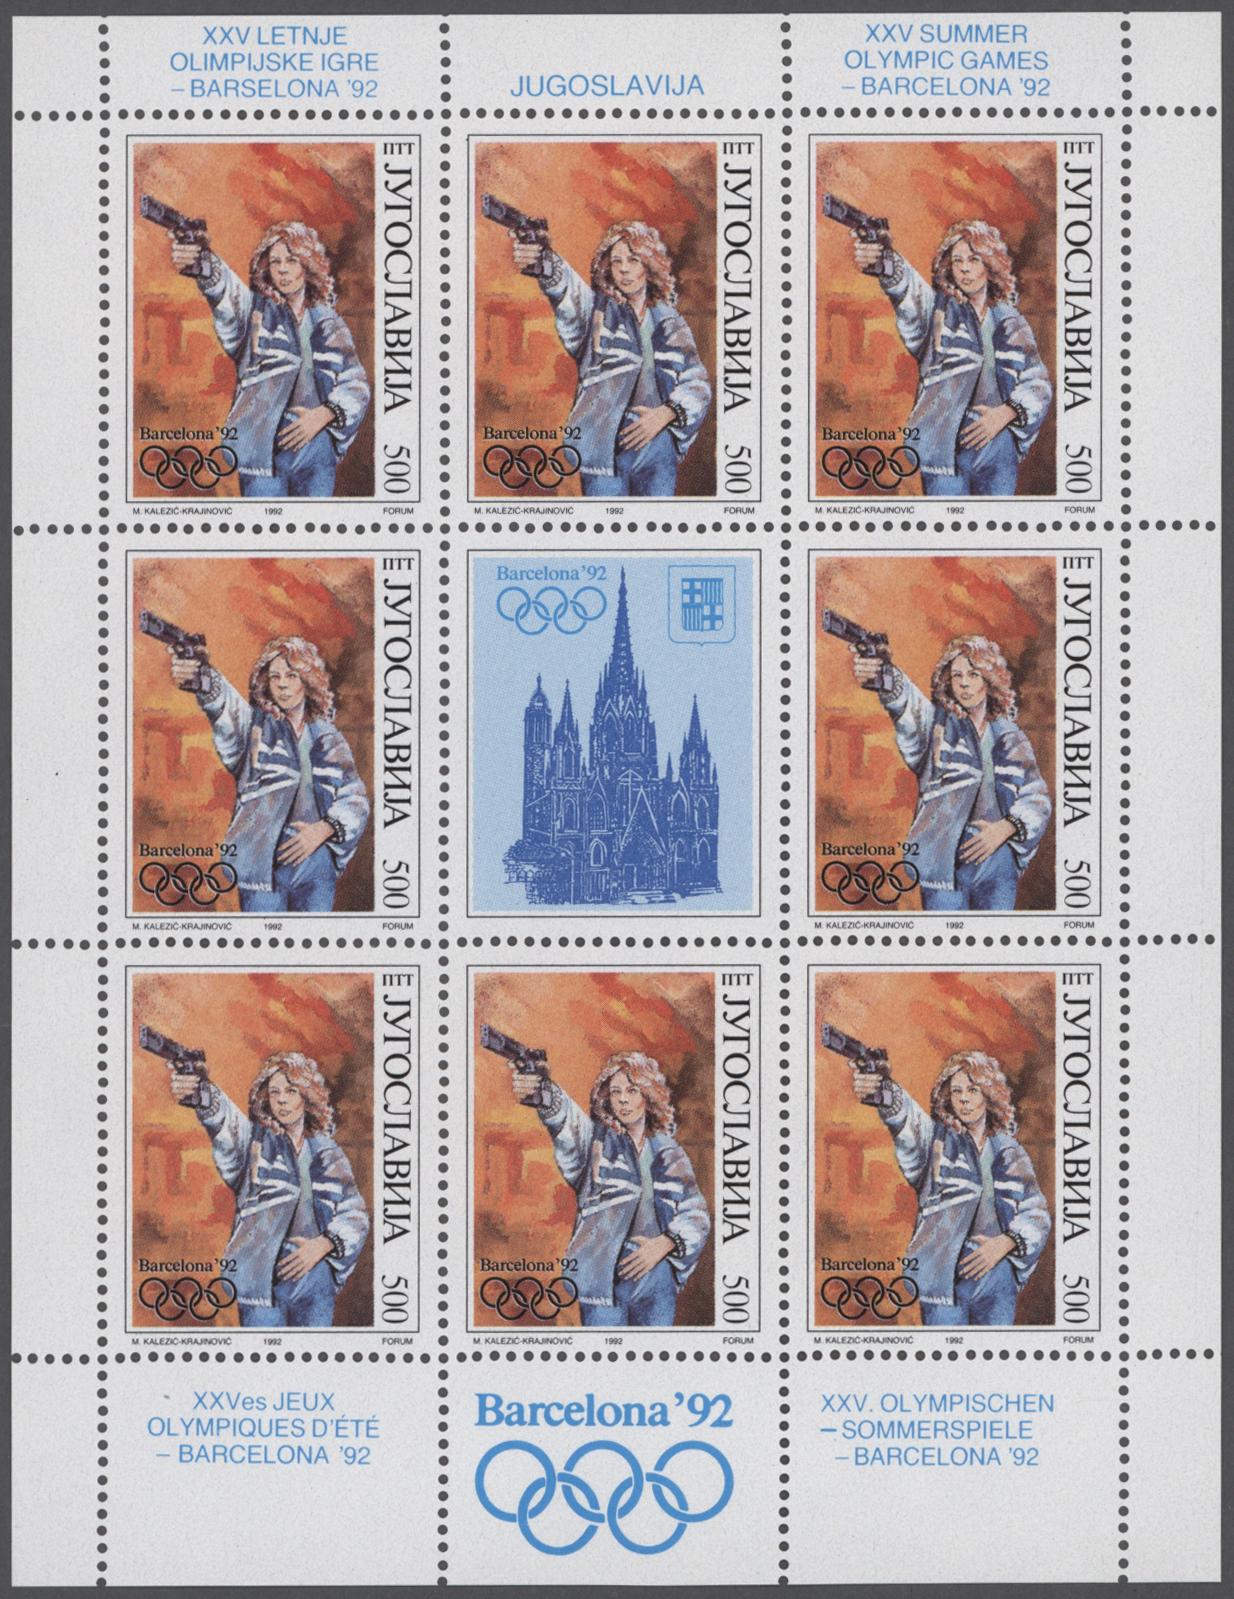 Lot 22178 - nachlässe  -  Auktionshaus Christoph Gärtner GmbH & Co. KG Sale #49 Collections Overseas, Thematics, Europe, Germany/Estates